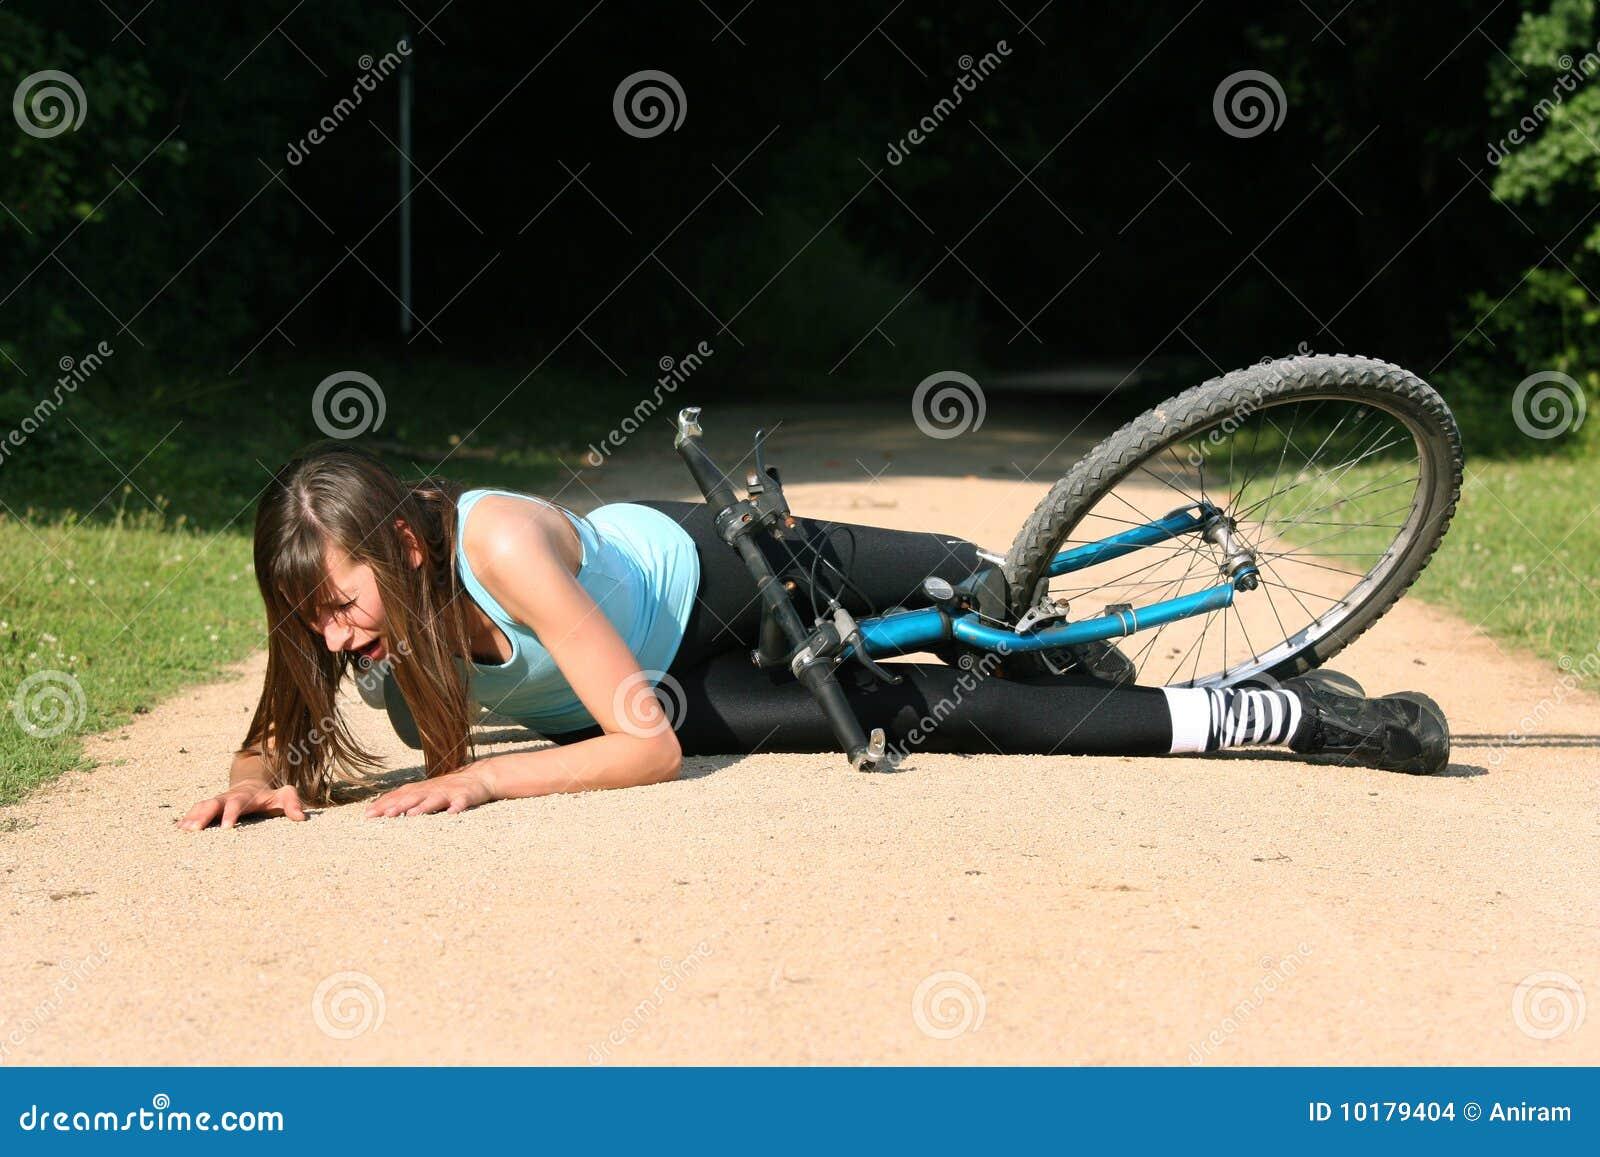 Crash With Bike Stock Images Image 10179404